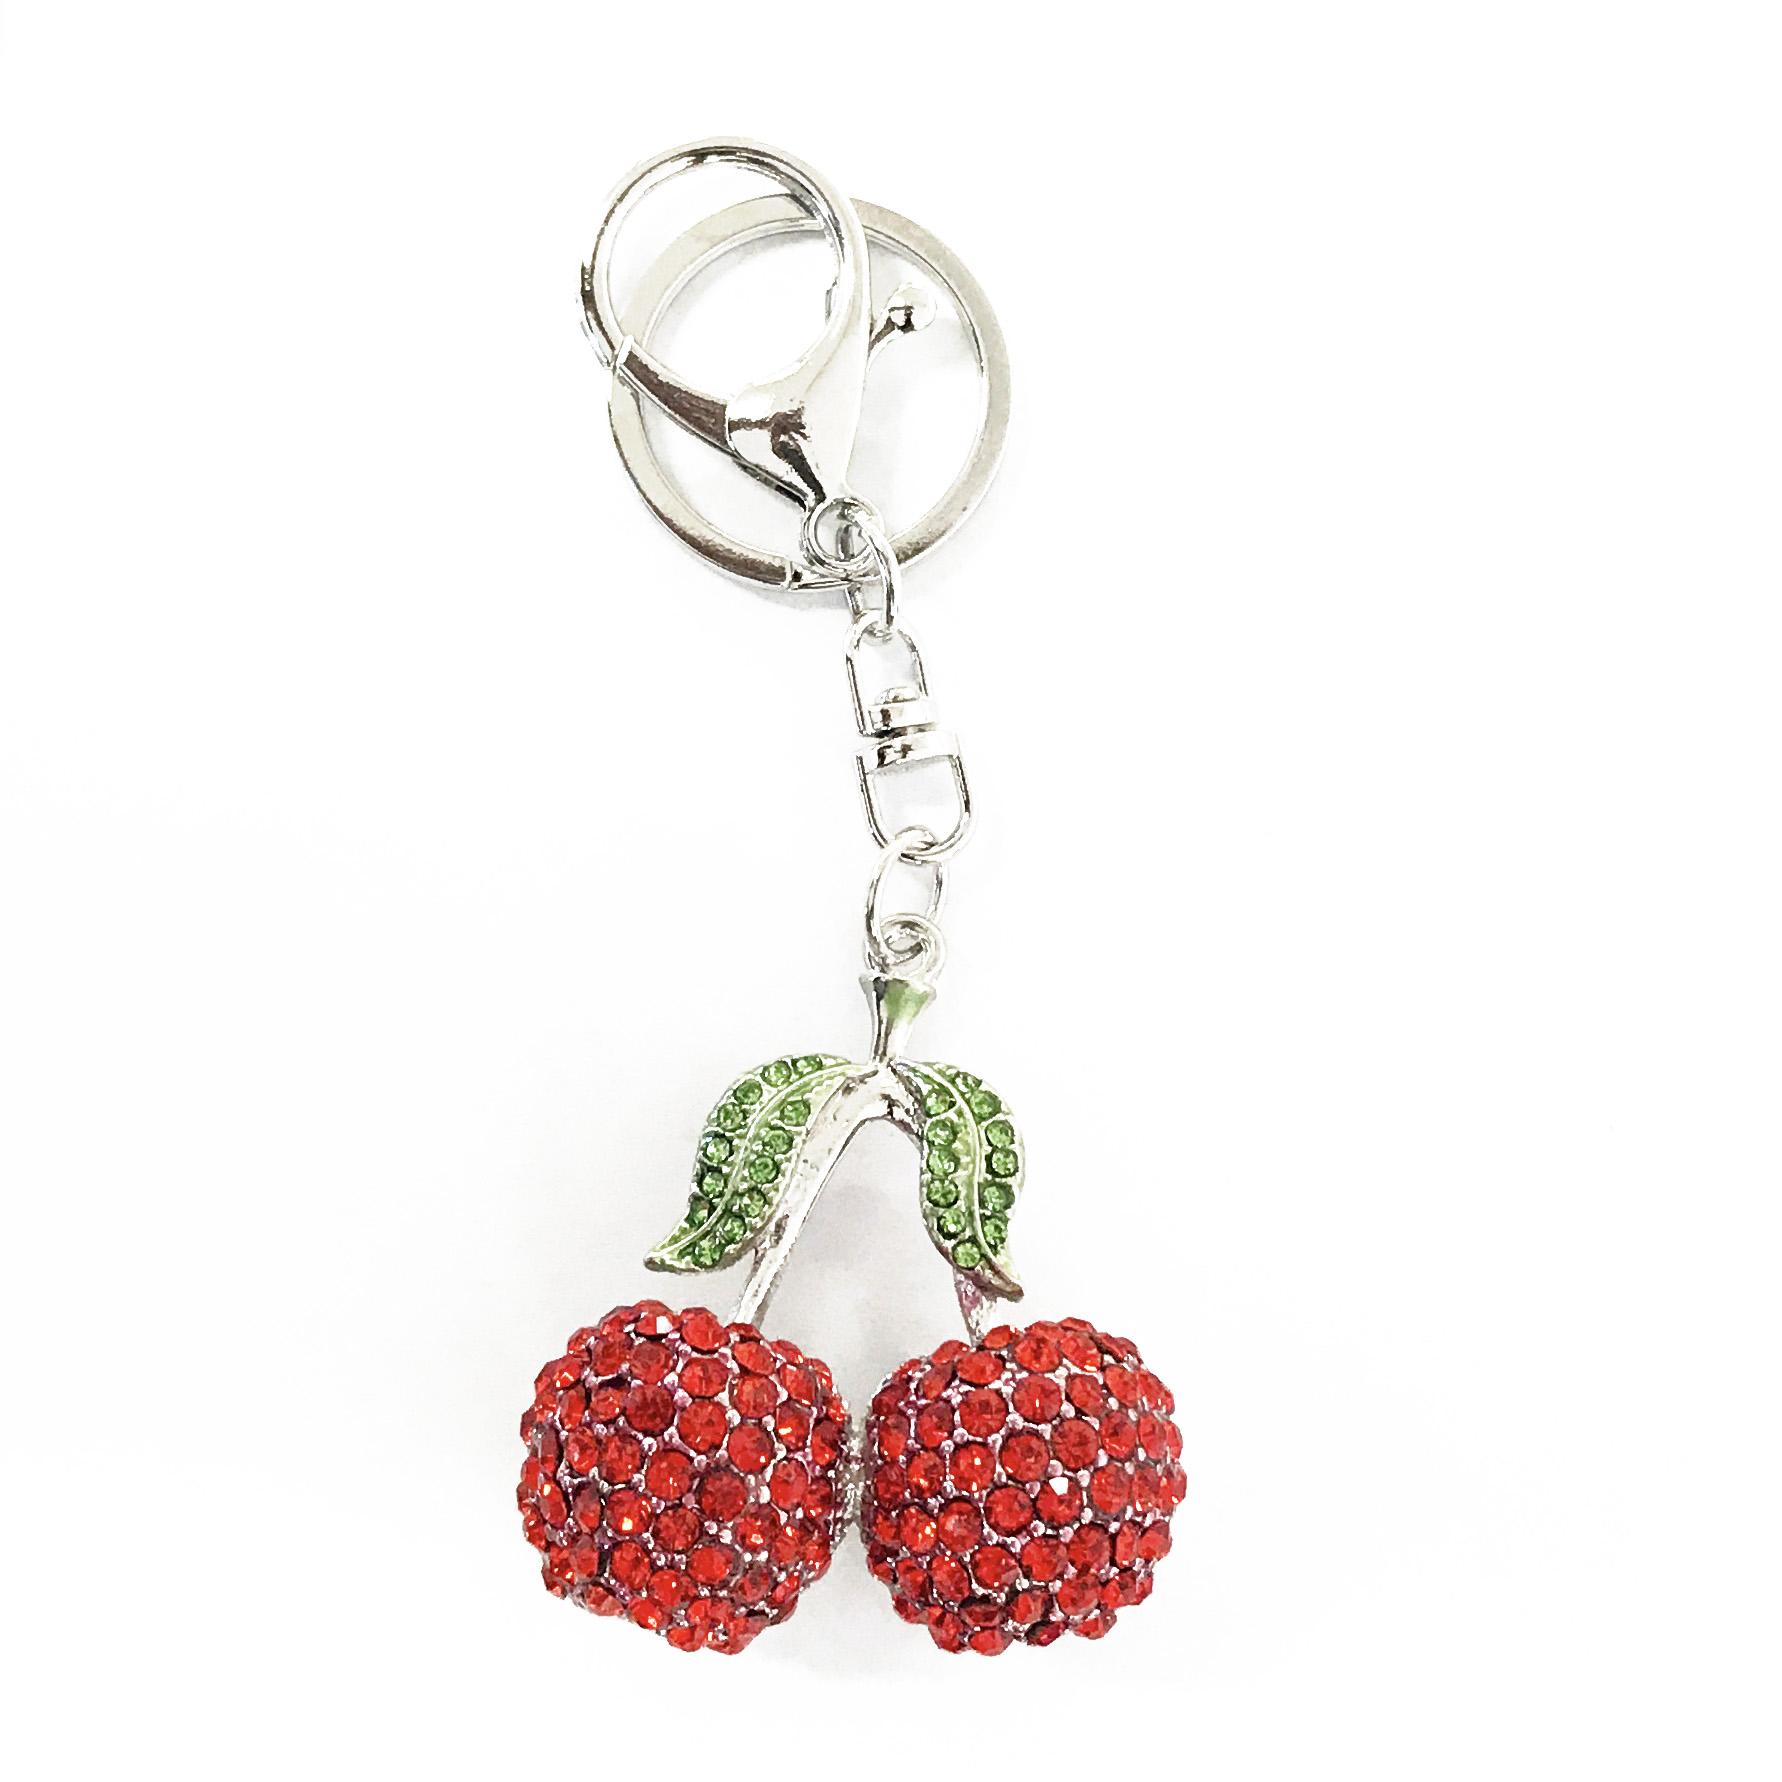 cherries bag charm